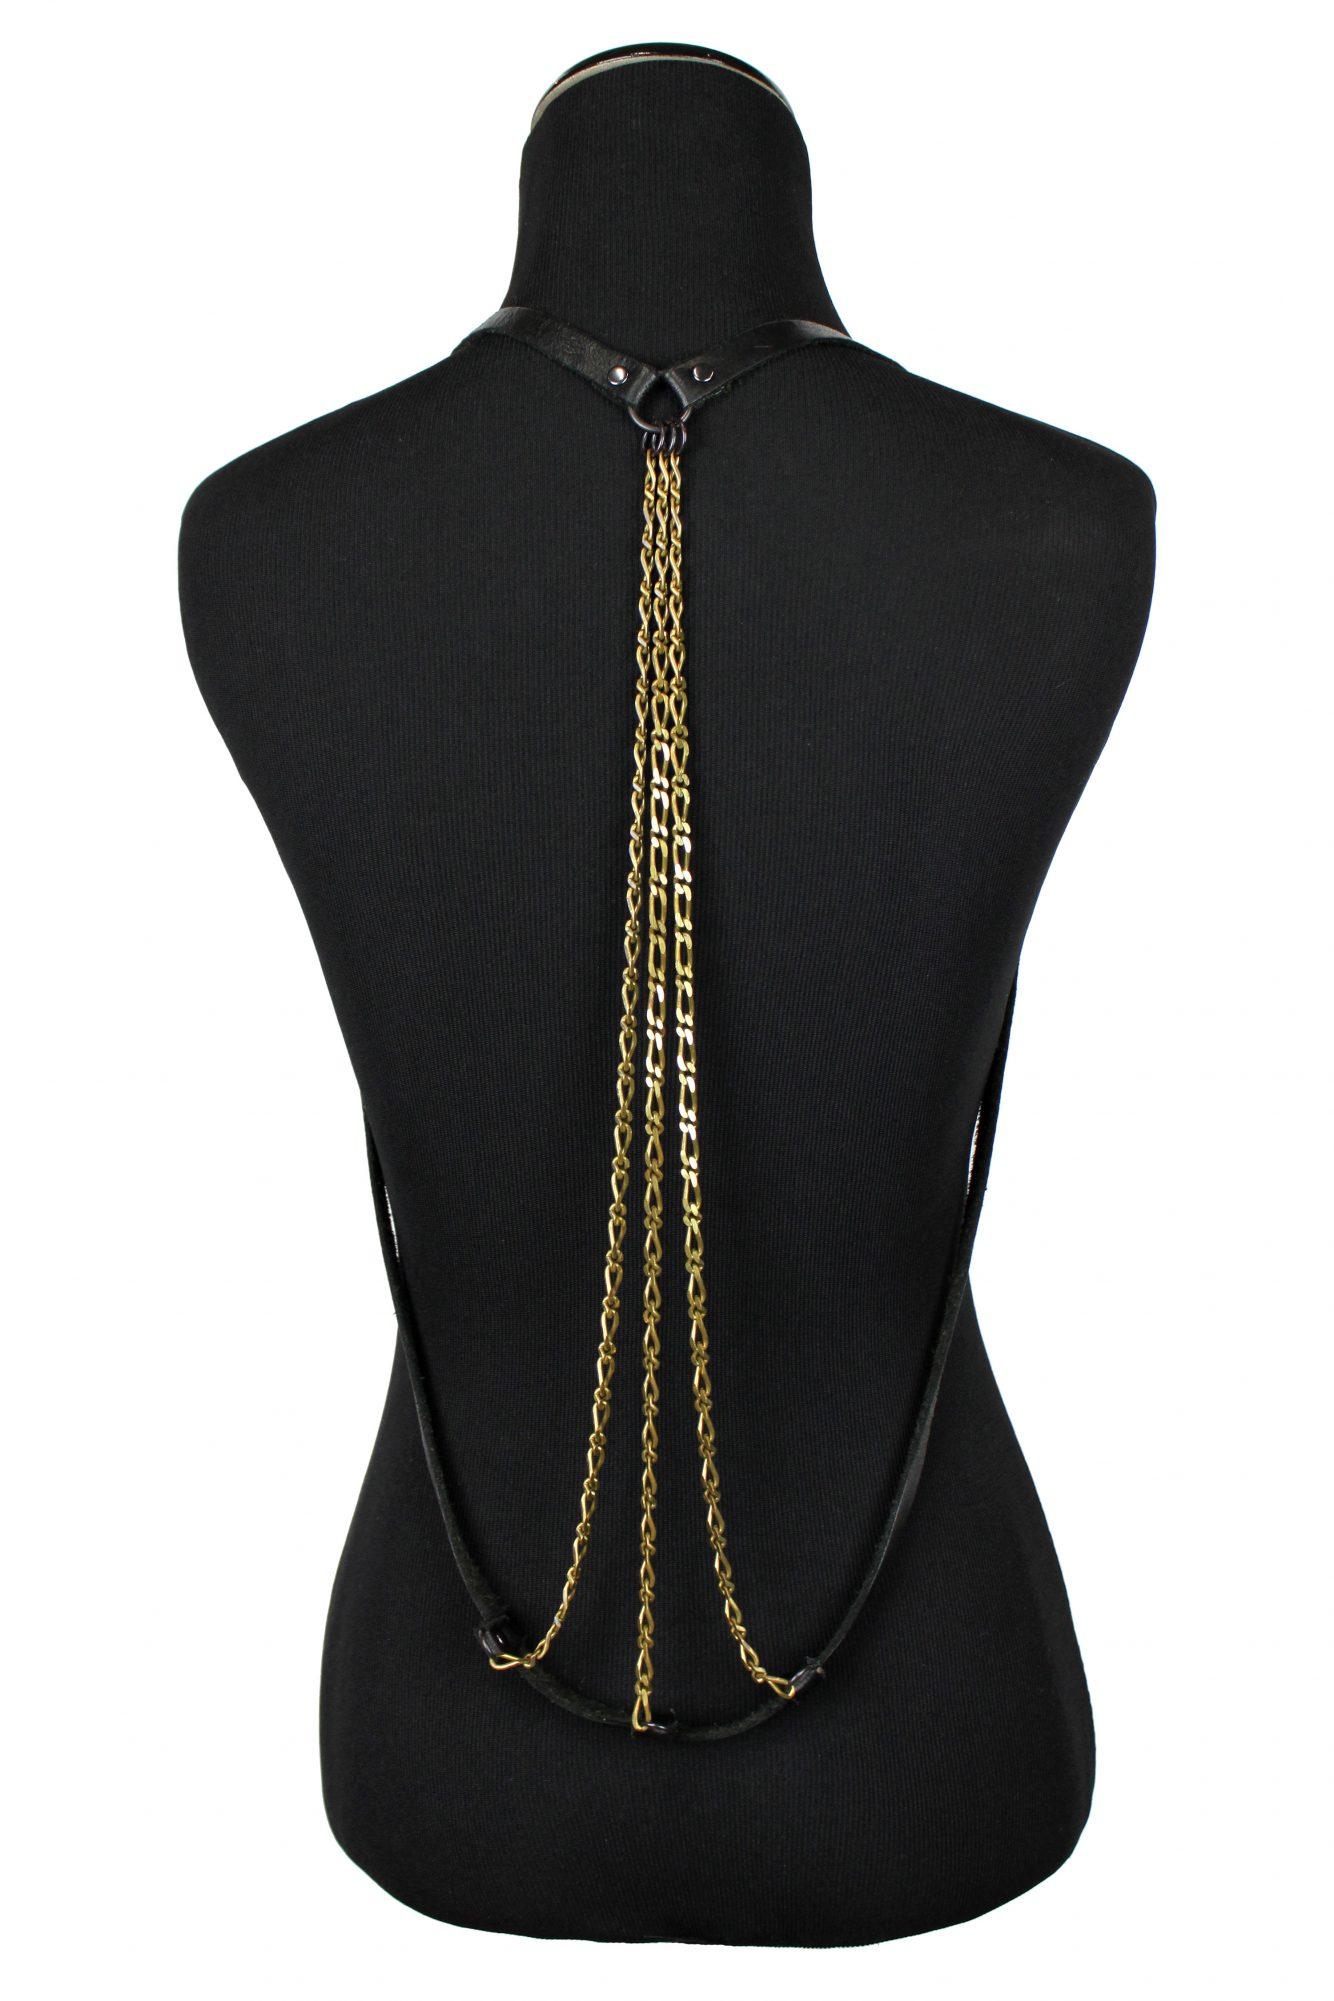 harness5-full